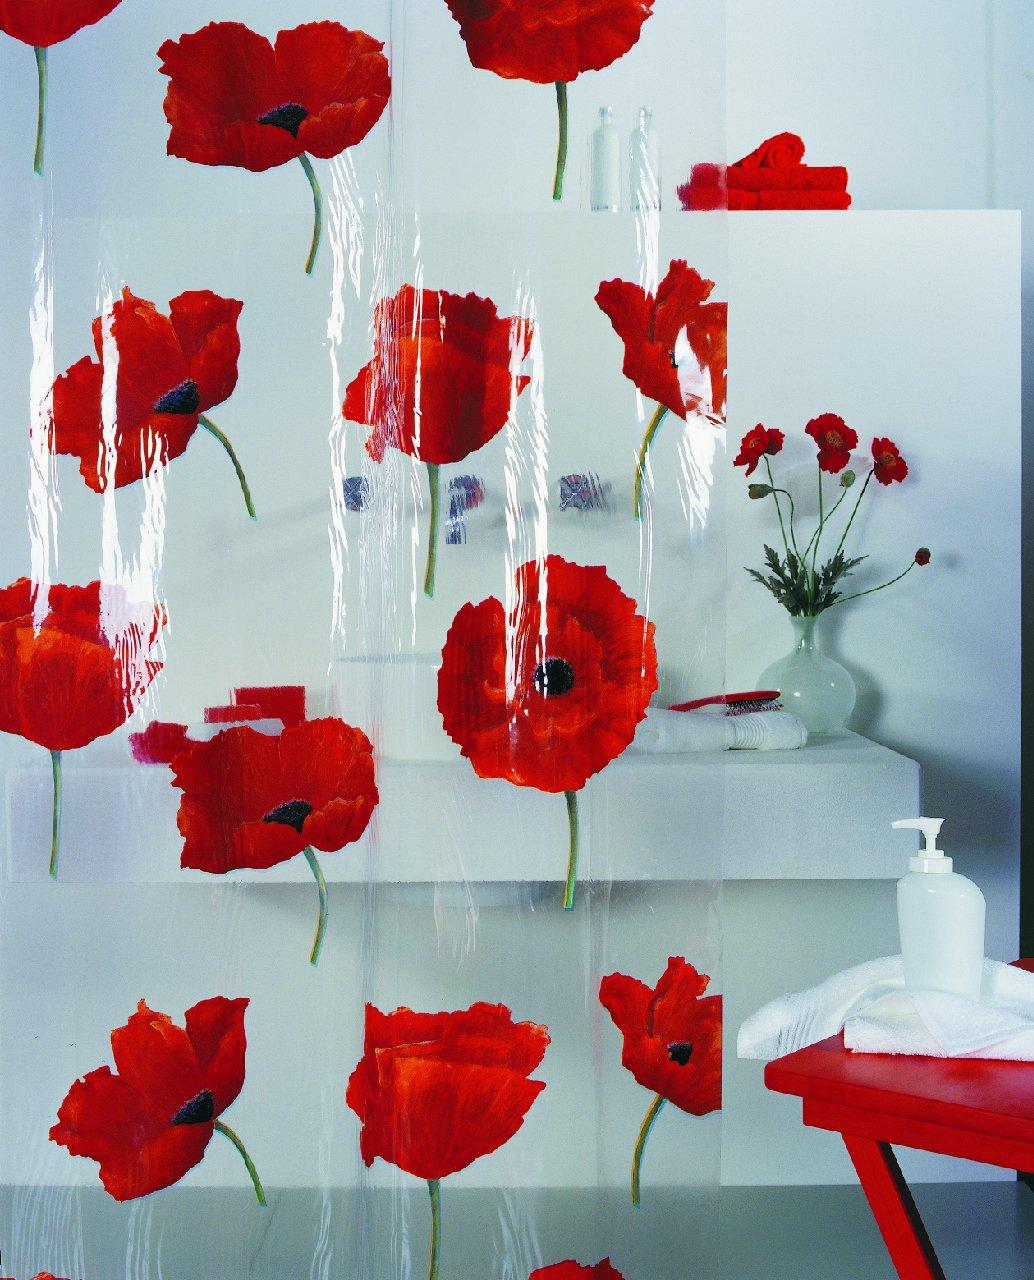 Clear fish shower curtain - Spirella Poppy Cinnibar Peva Plastic Transparent Shower Curtain With Poppy Flower Pattern 180 X 200